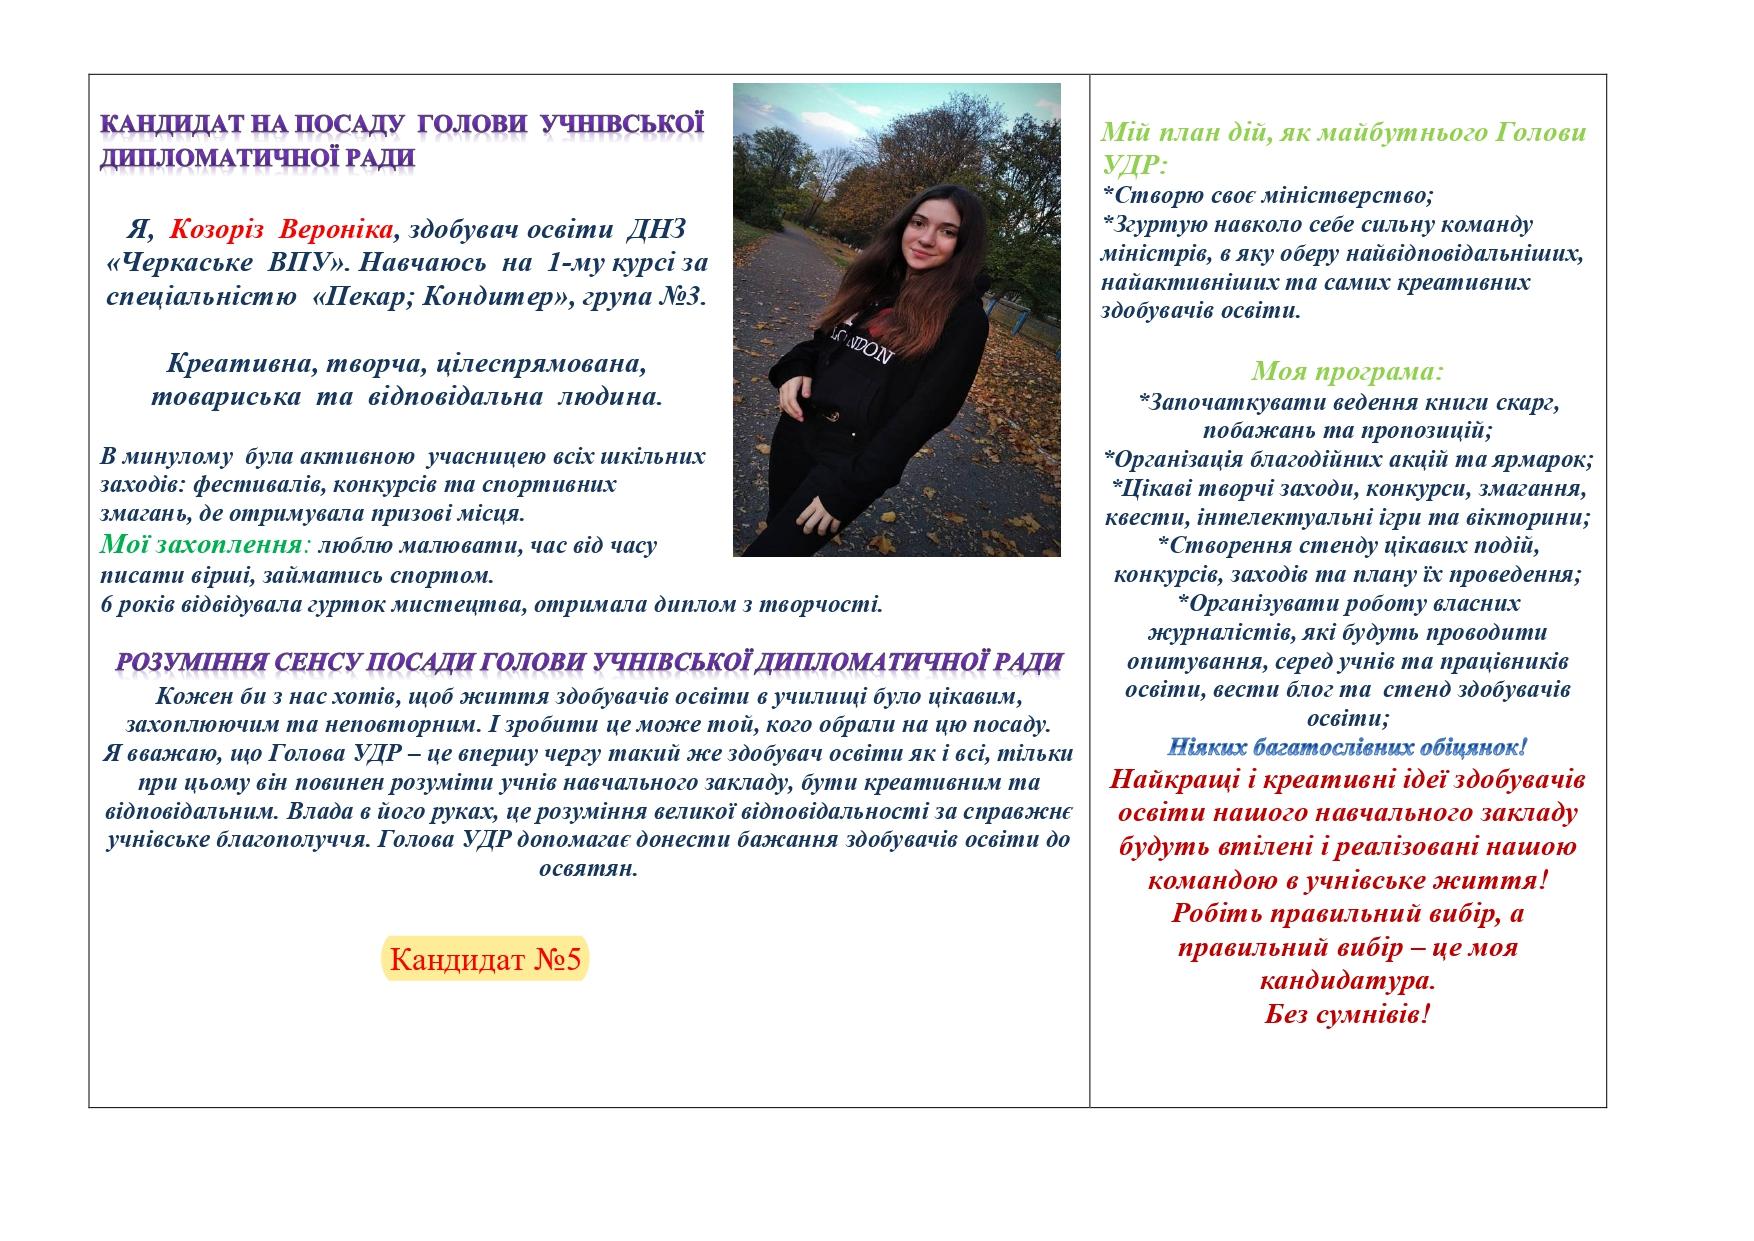 КАНДИДАТ5_page-0001